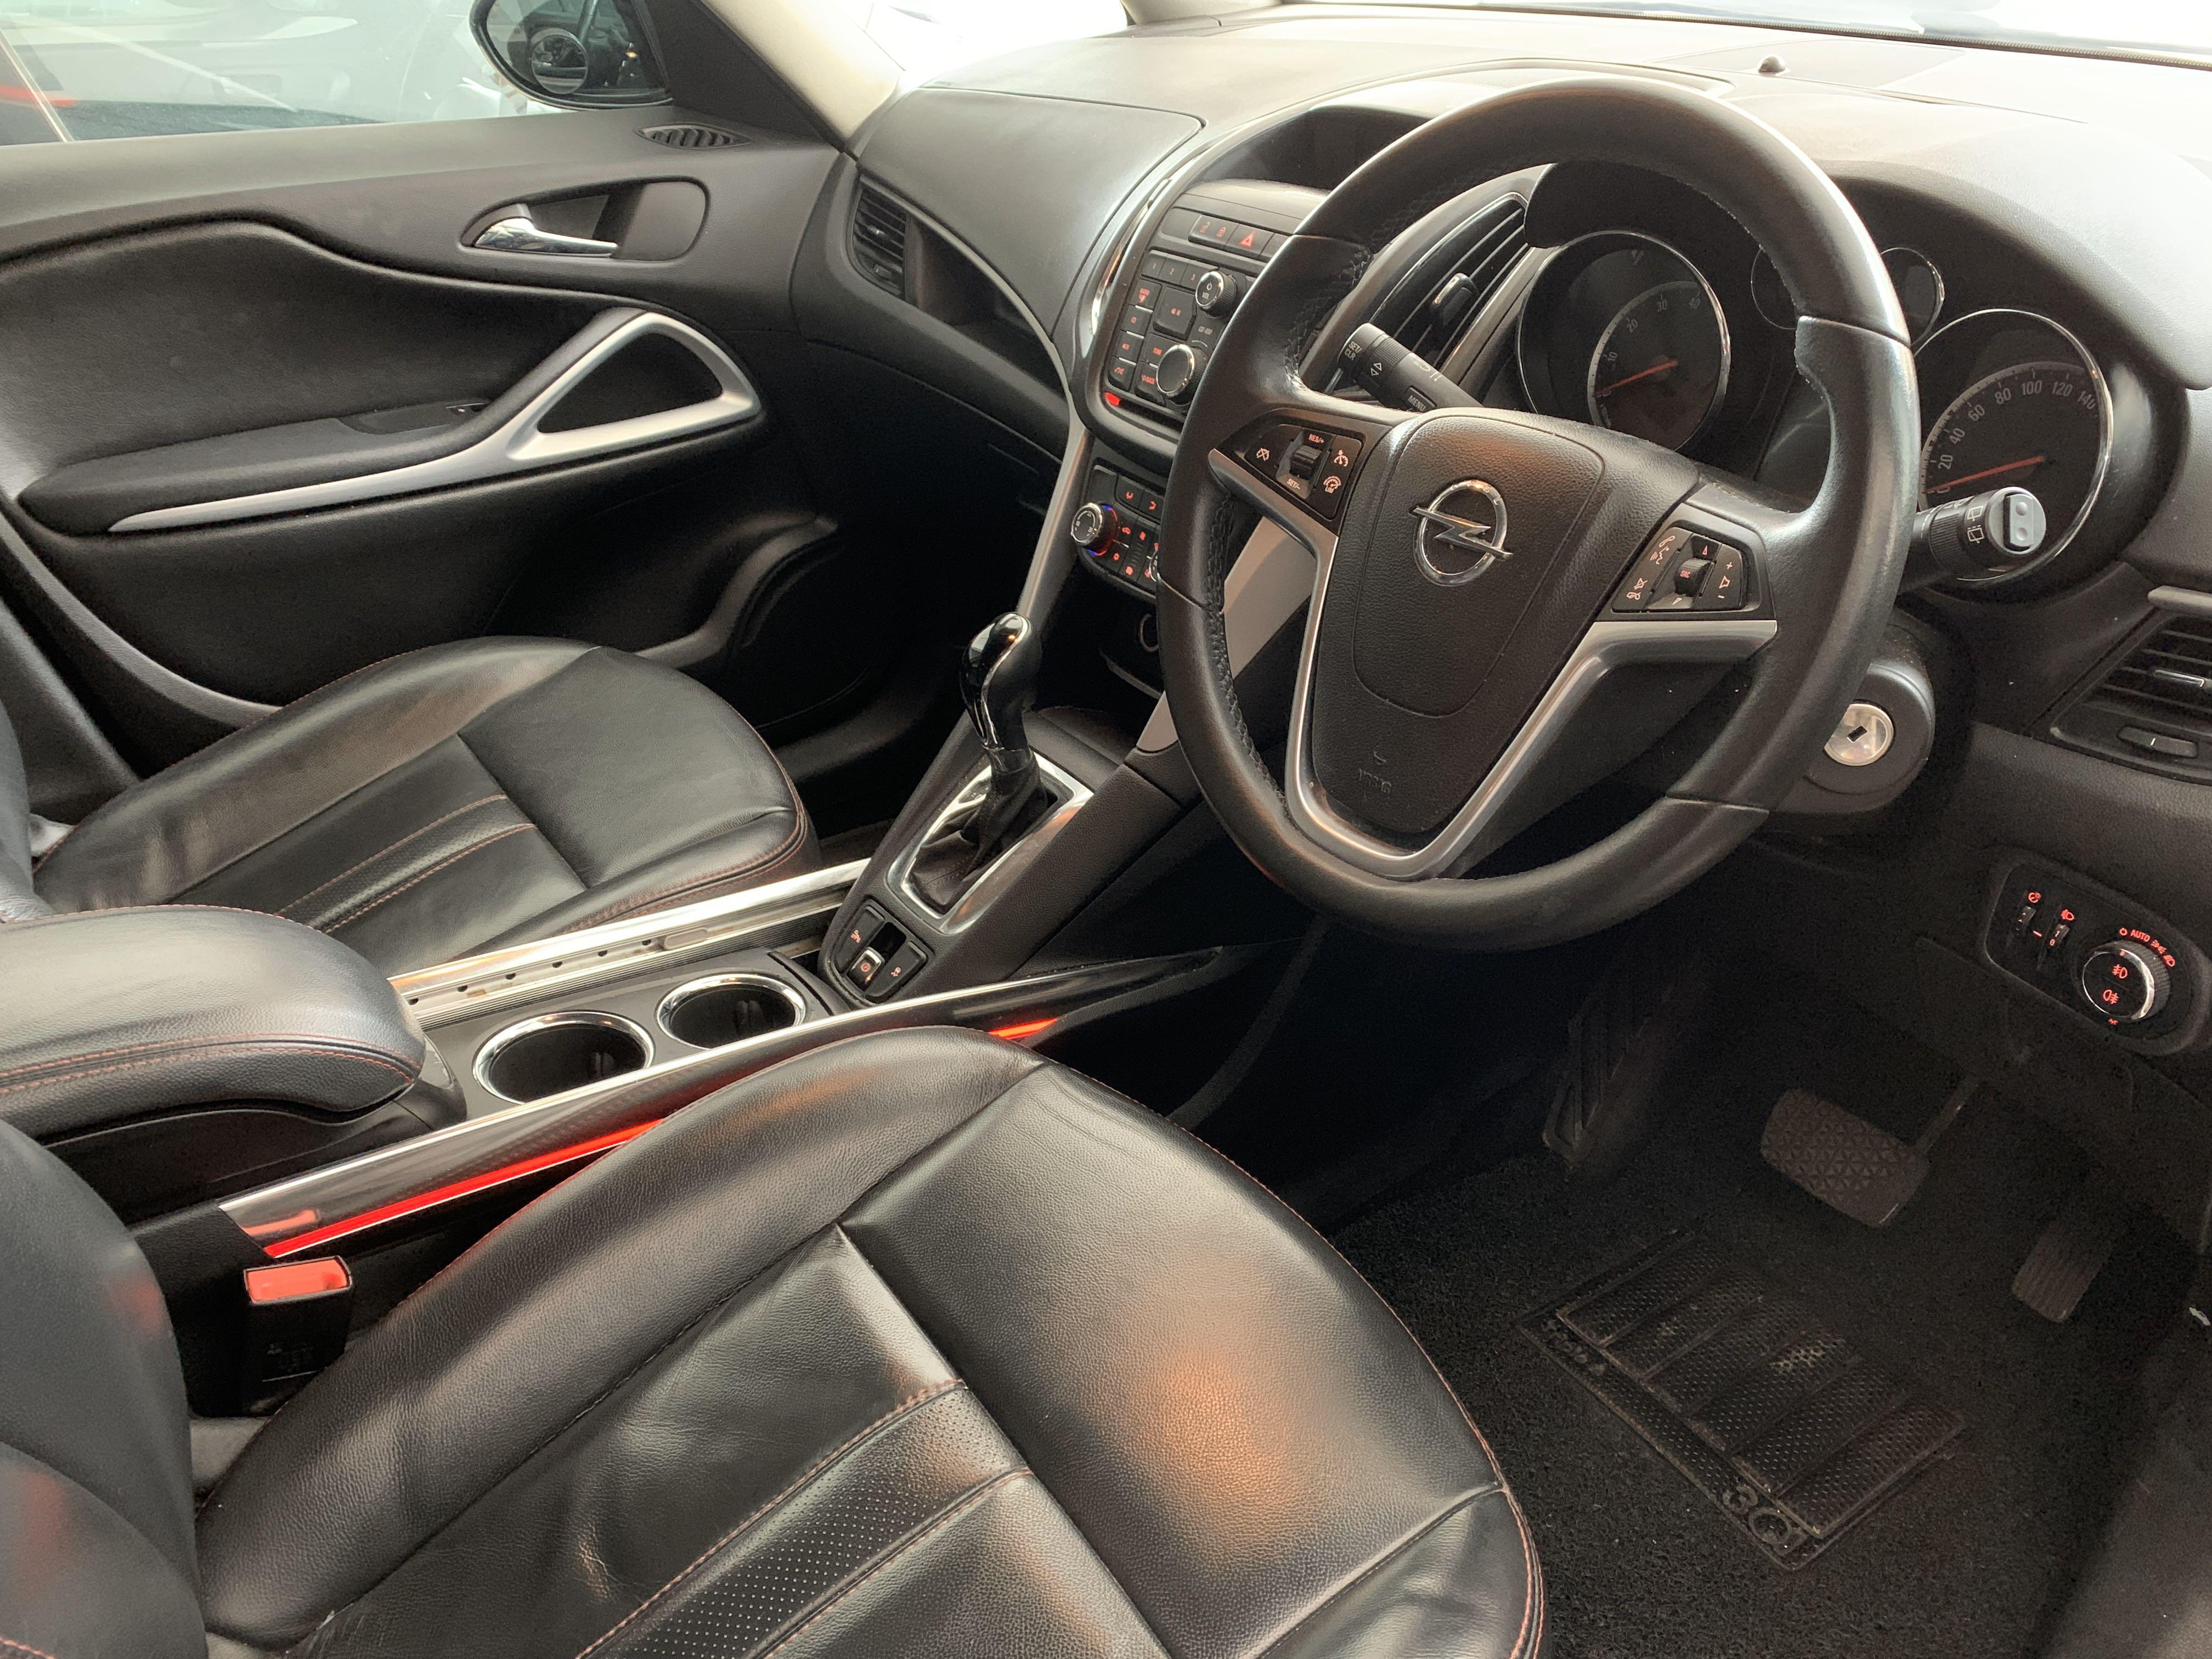 Opel Zafira MPV for rent